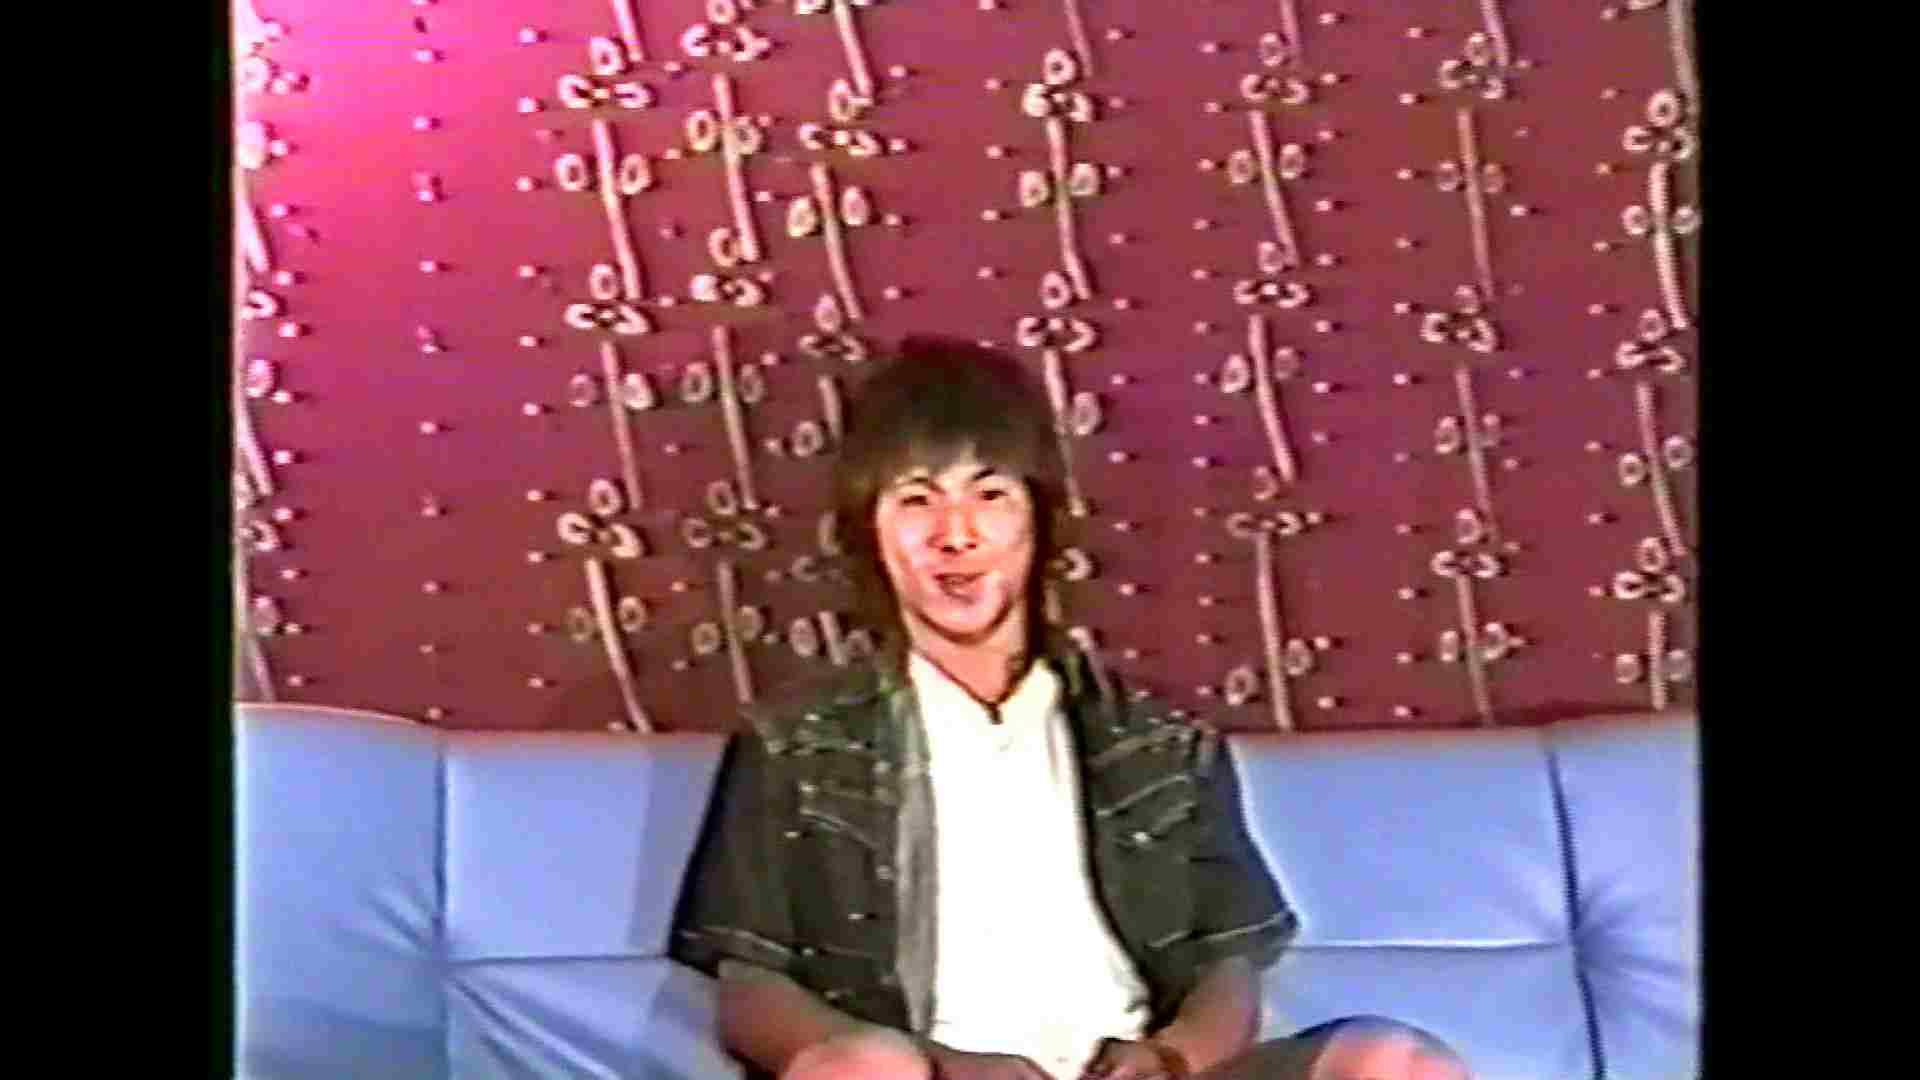 GAYBOY宏のオカズ倉庫Vol.3-1 GAY ゲイセックス画像 103画像 15